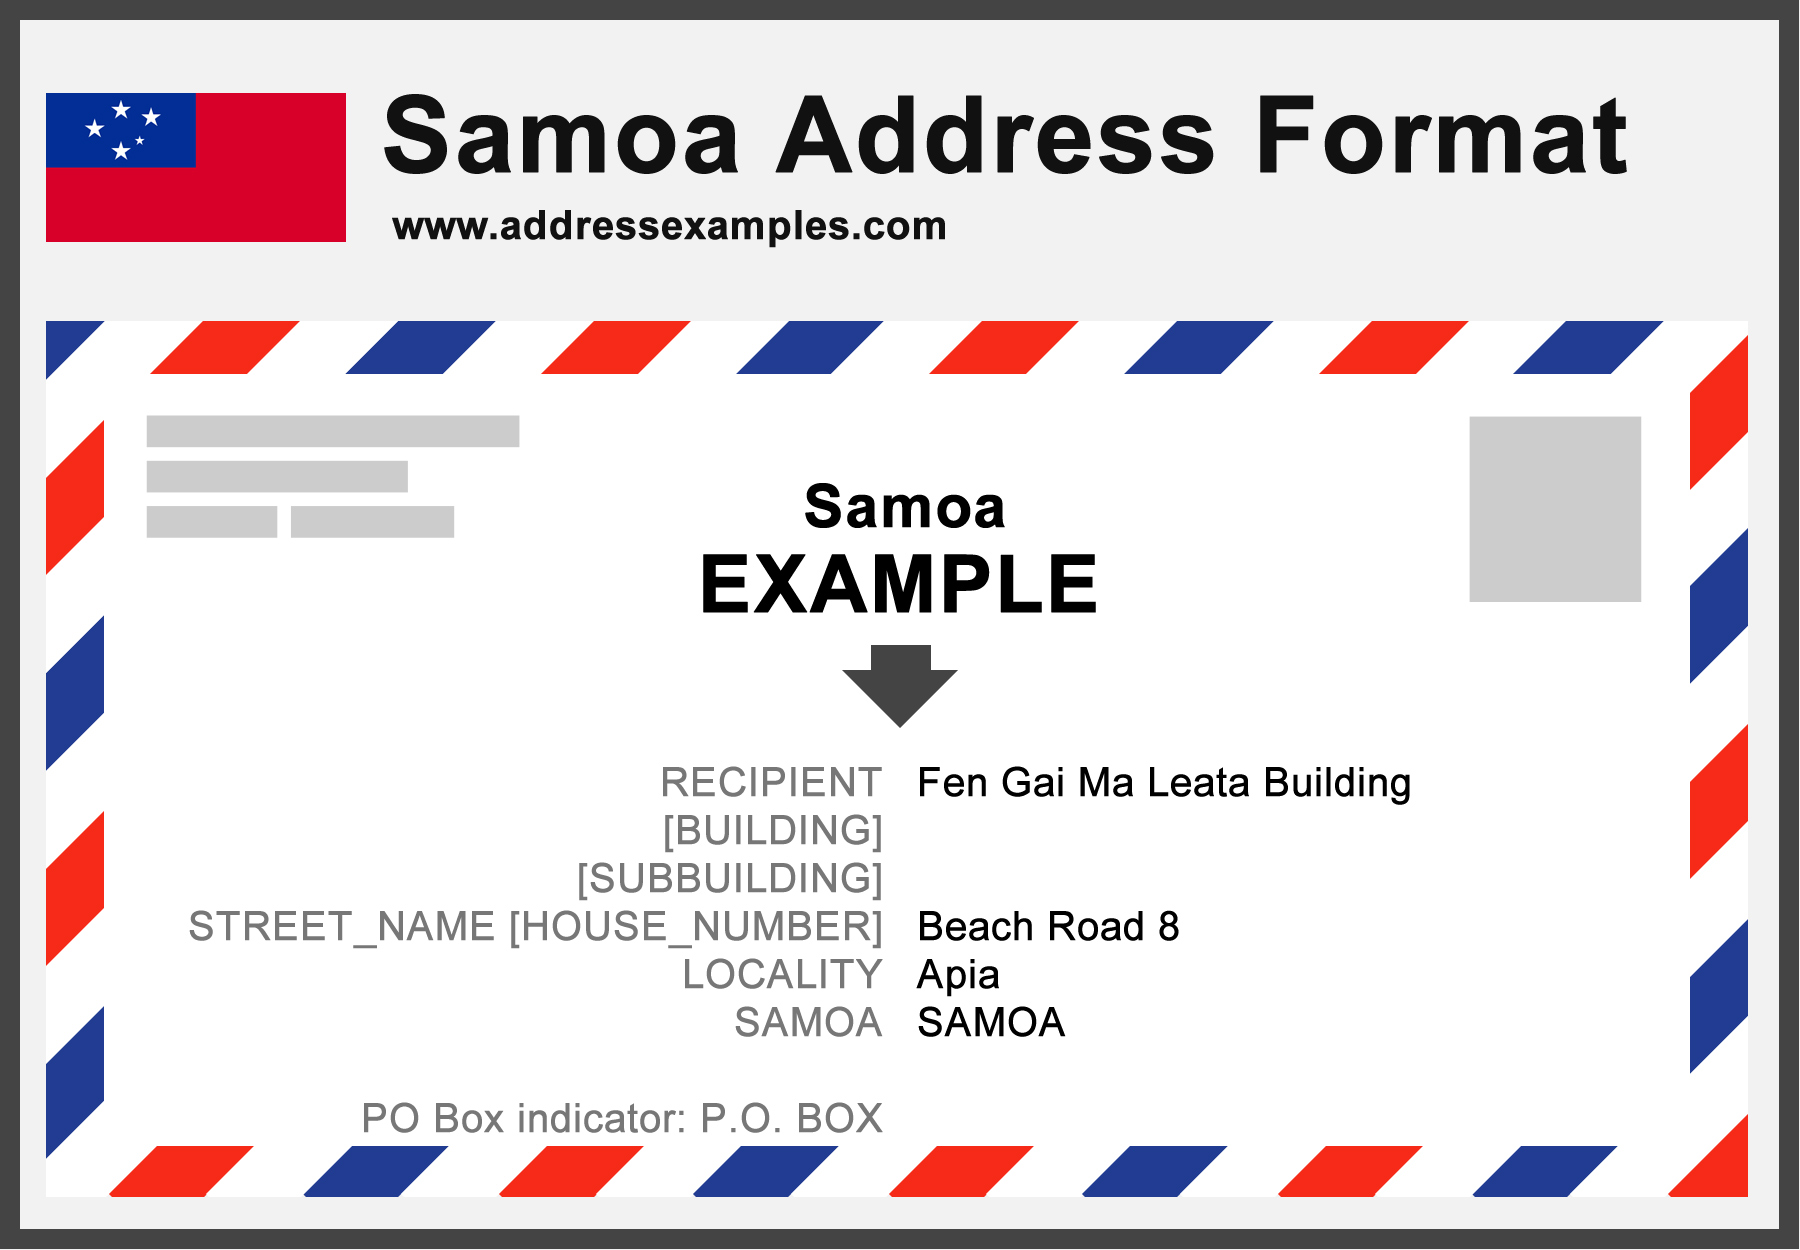 Samoa Address Format